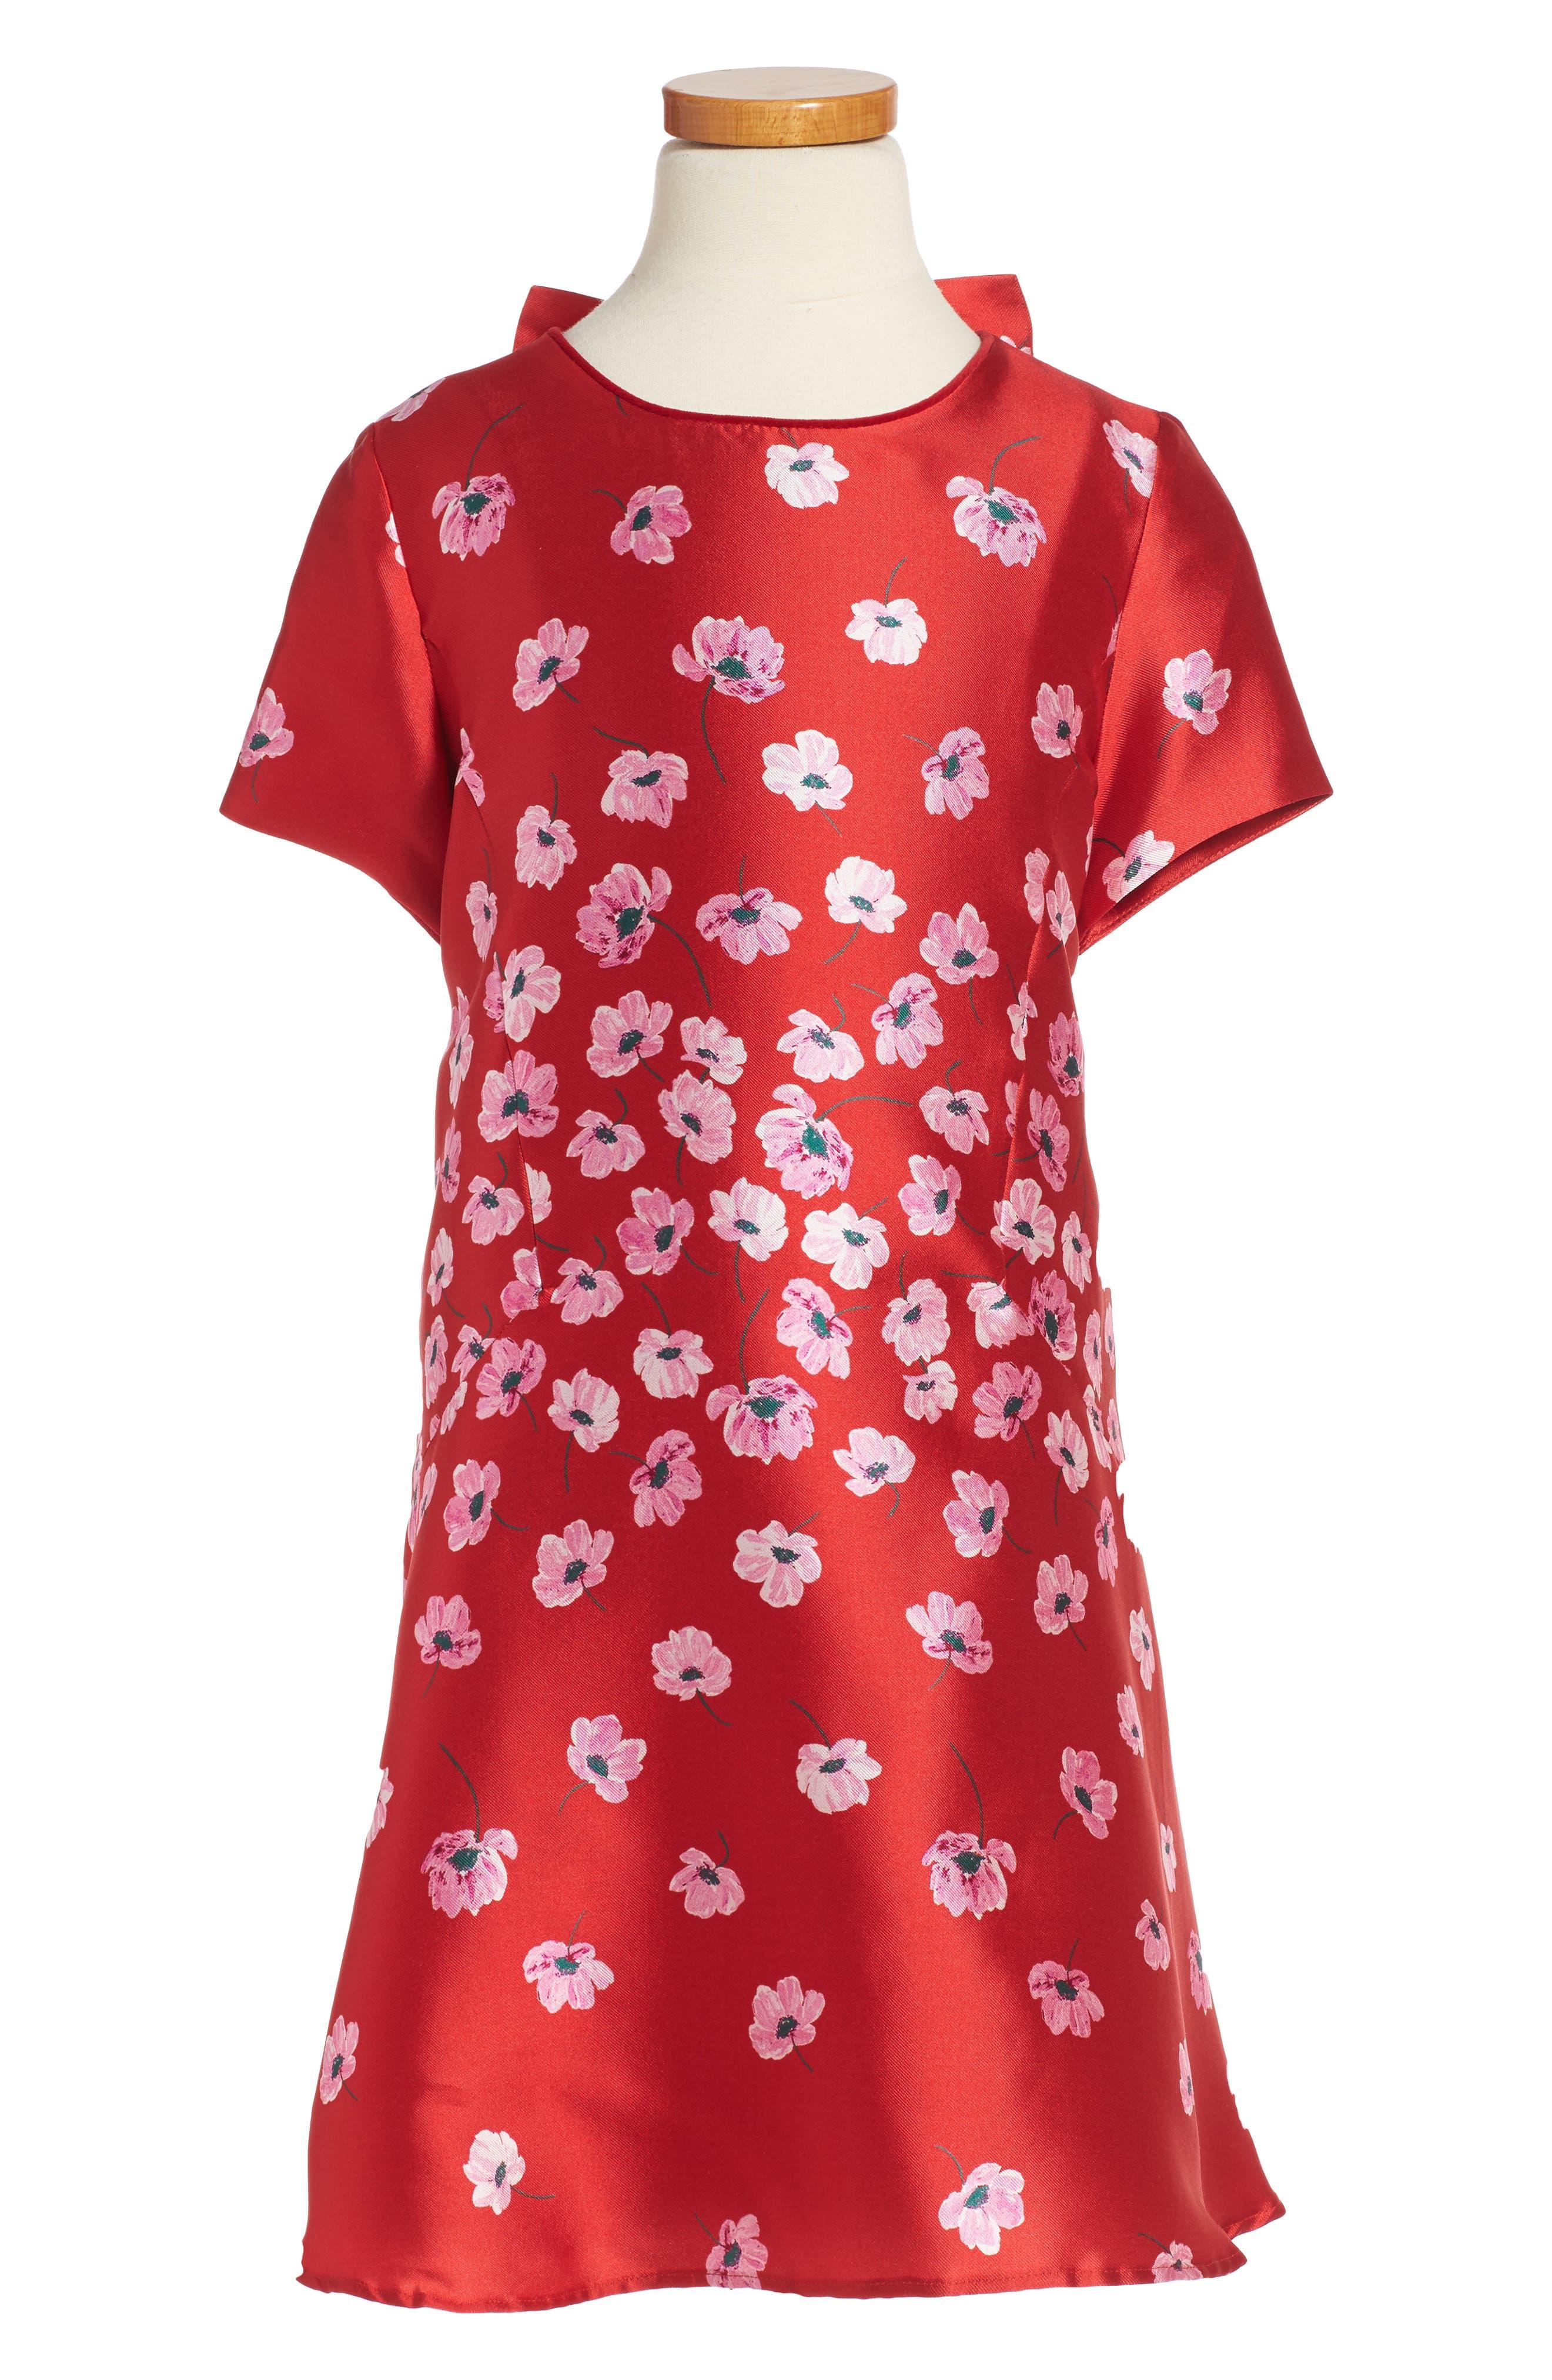 Oscar de la Renta Poppies Mikado Dress (Big Girls)